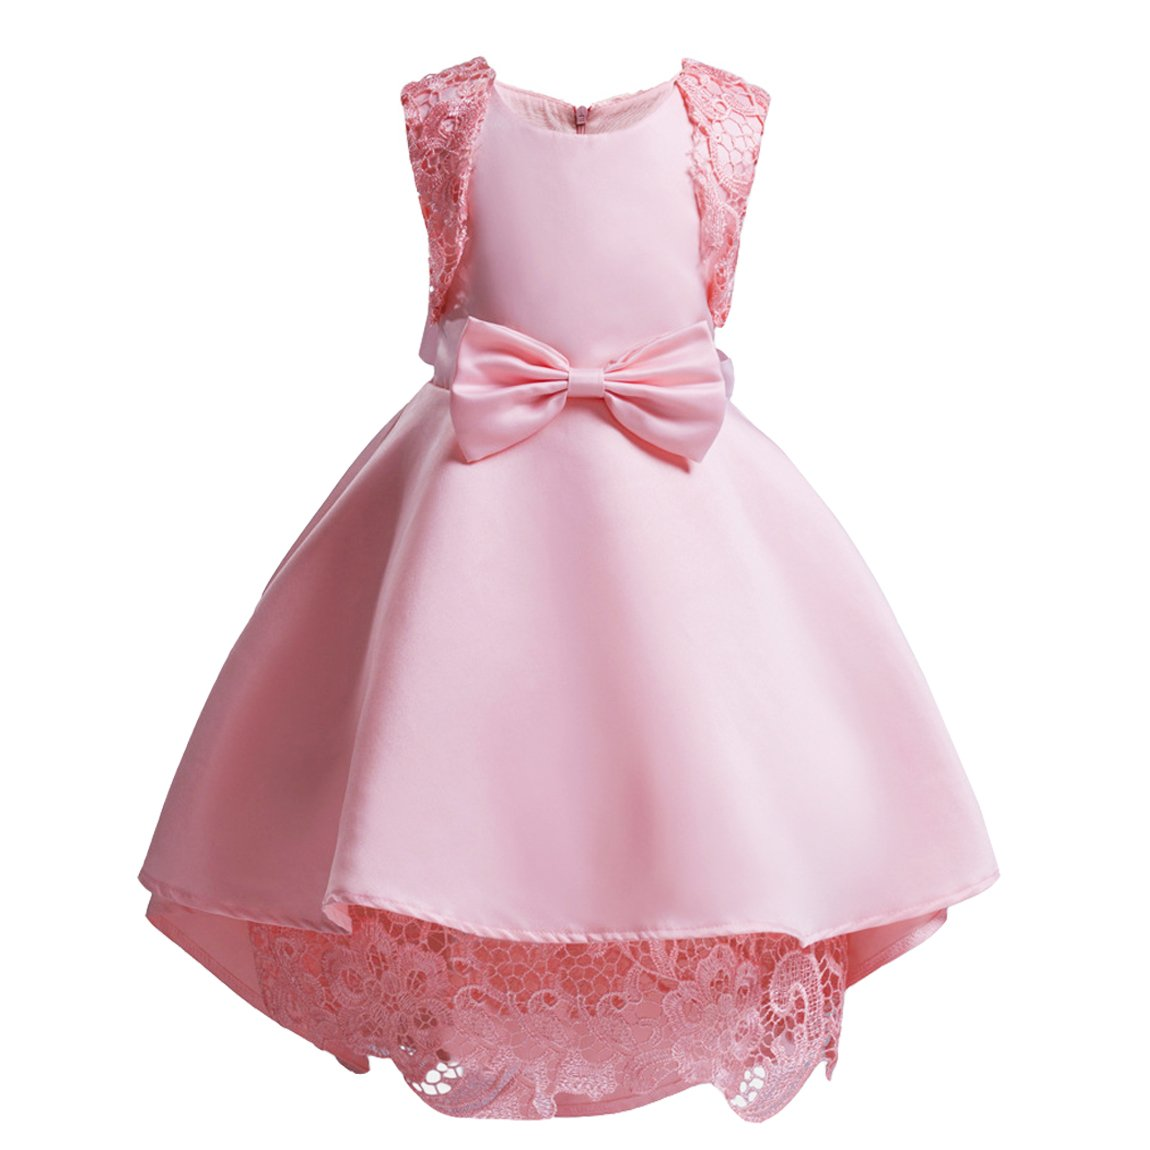 de1e0e626 Ideal casual dress for children, best gift for toddler girls, your princess  will love to wear it. A summer dress, floral dress, ...